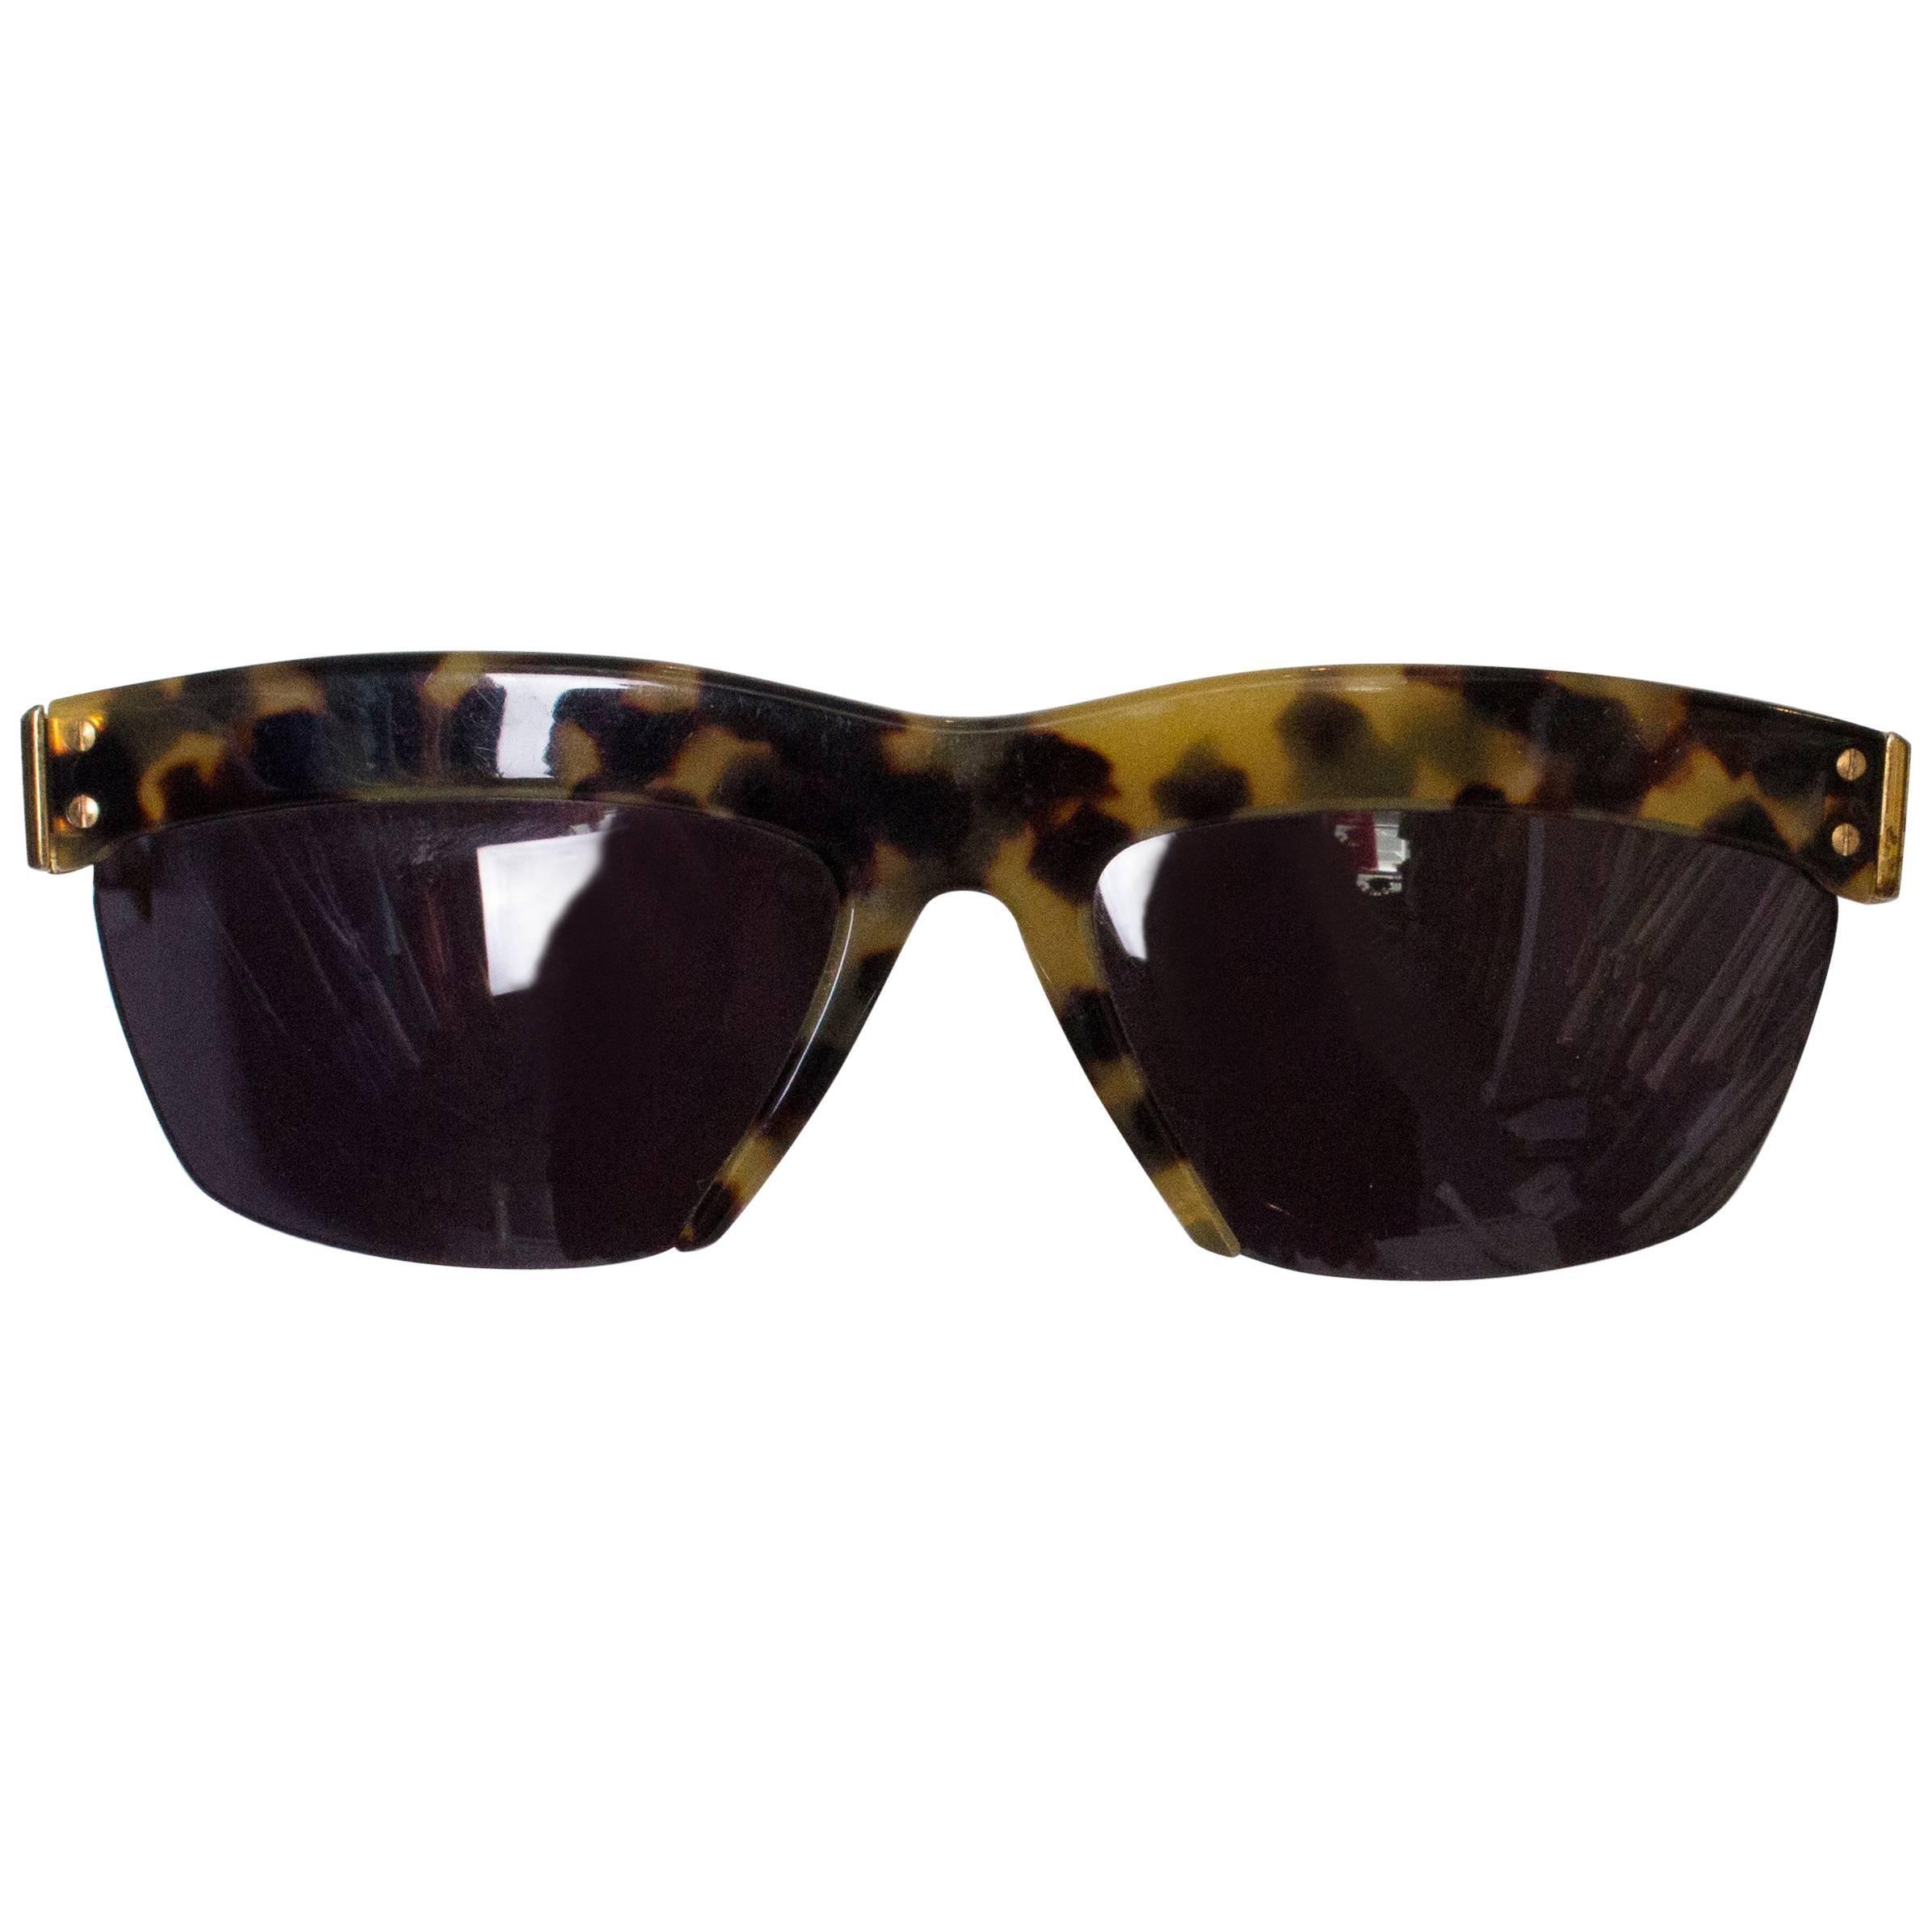 bd6005a095 Vintage Sunglasses For Sale in United Kingdom - 1stdibs